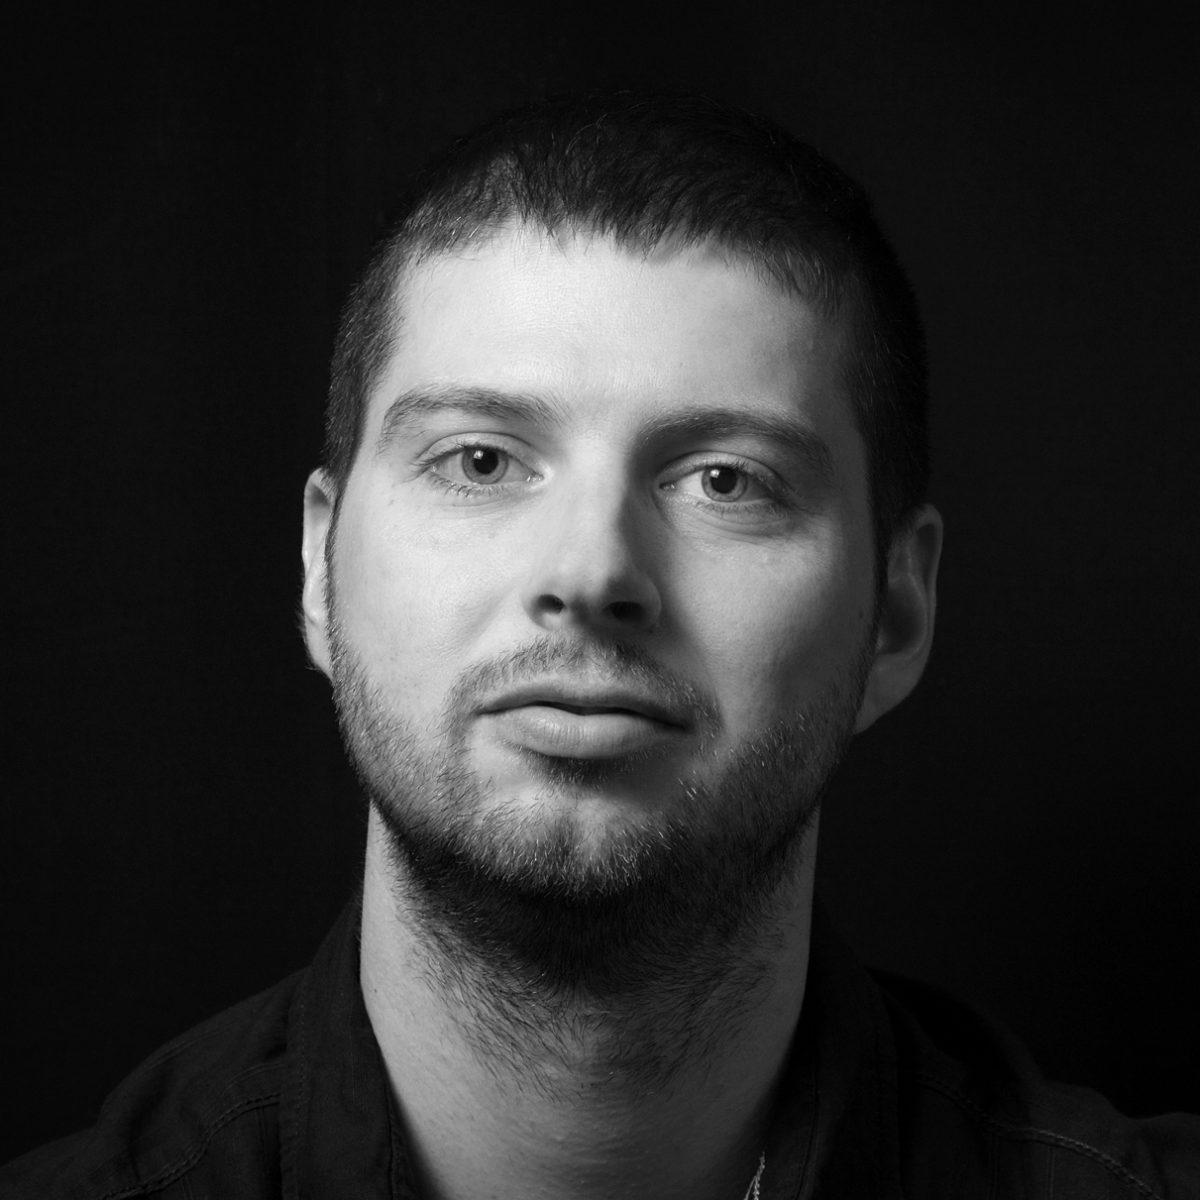 Klaus Rockenbauer